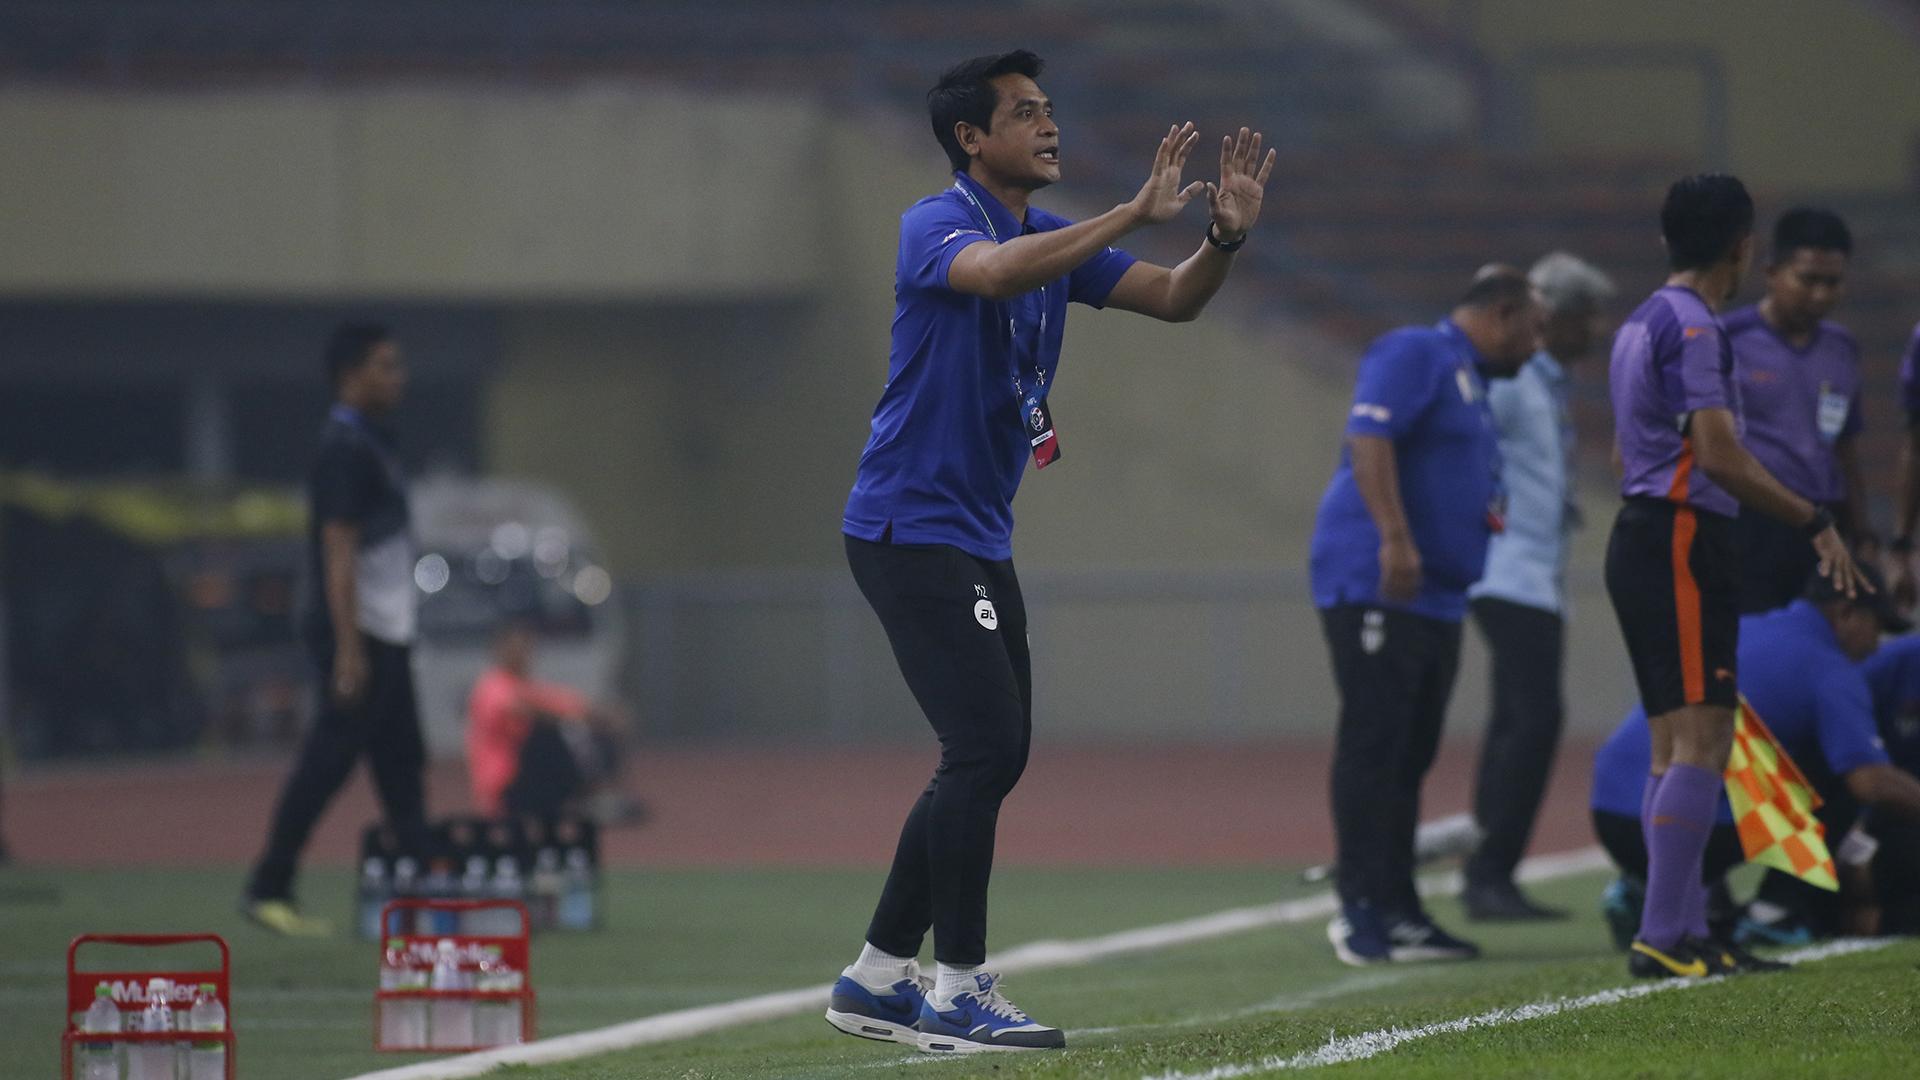 Nafuzi Zain, PKNS FC v Terengganu FC, Malaysia Cup, 17 Sep 2019